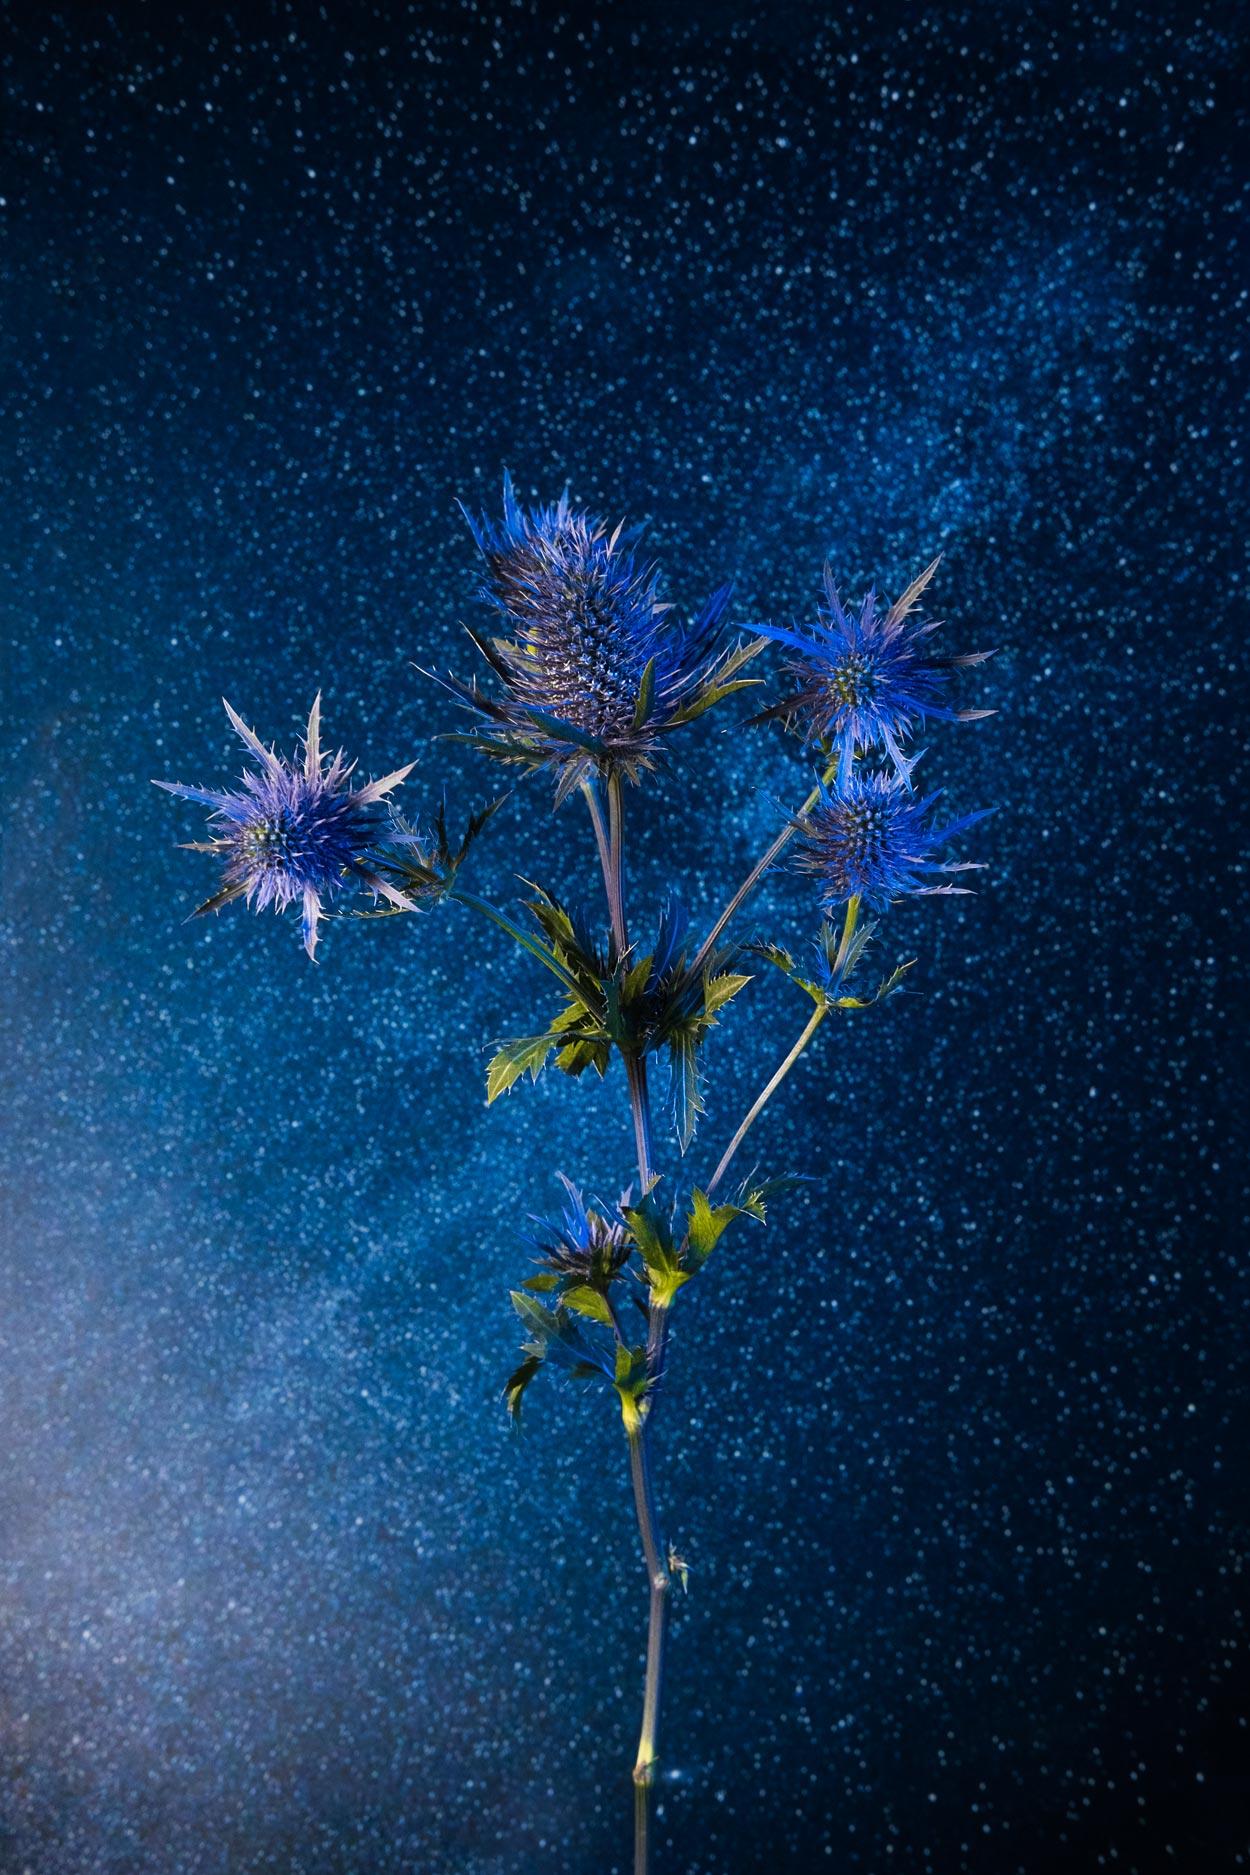 flowersinspace_01